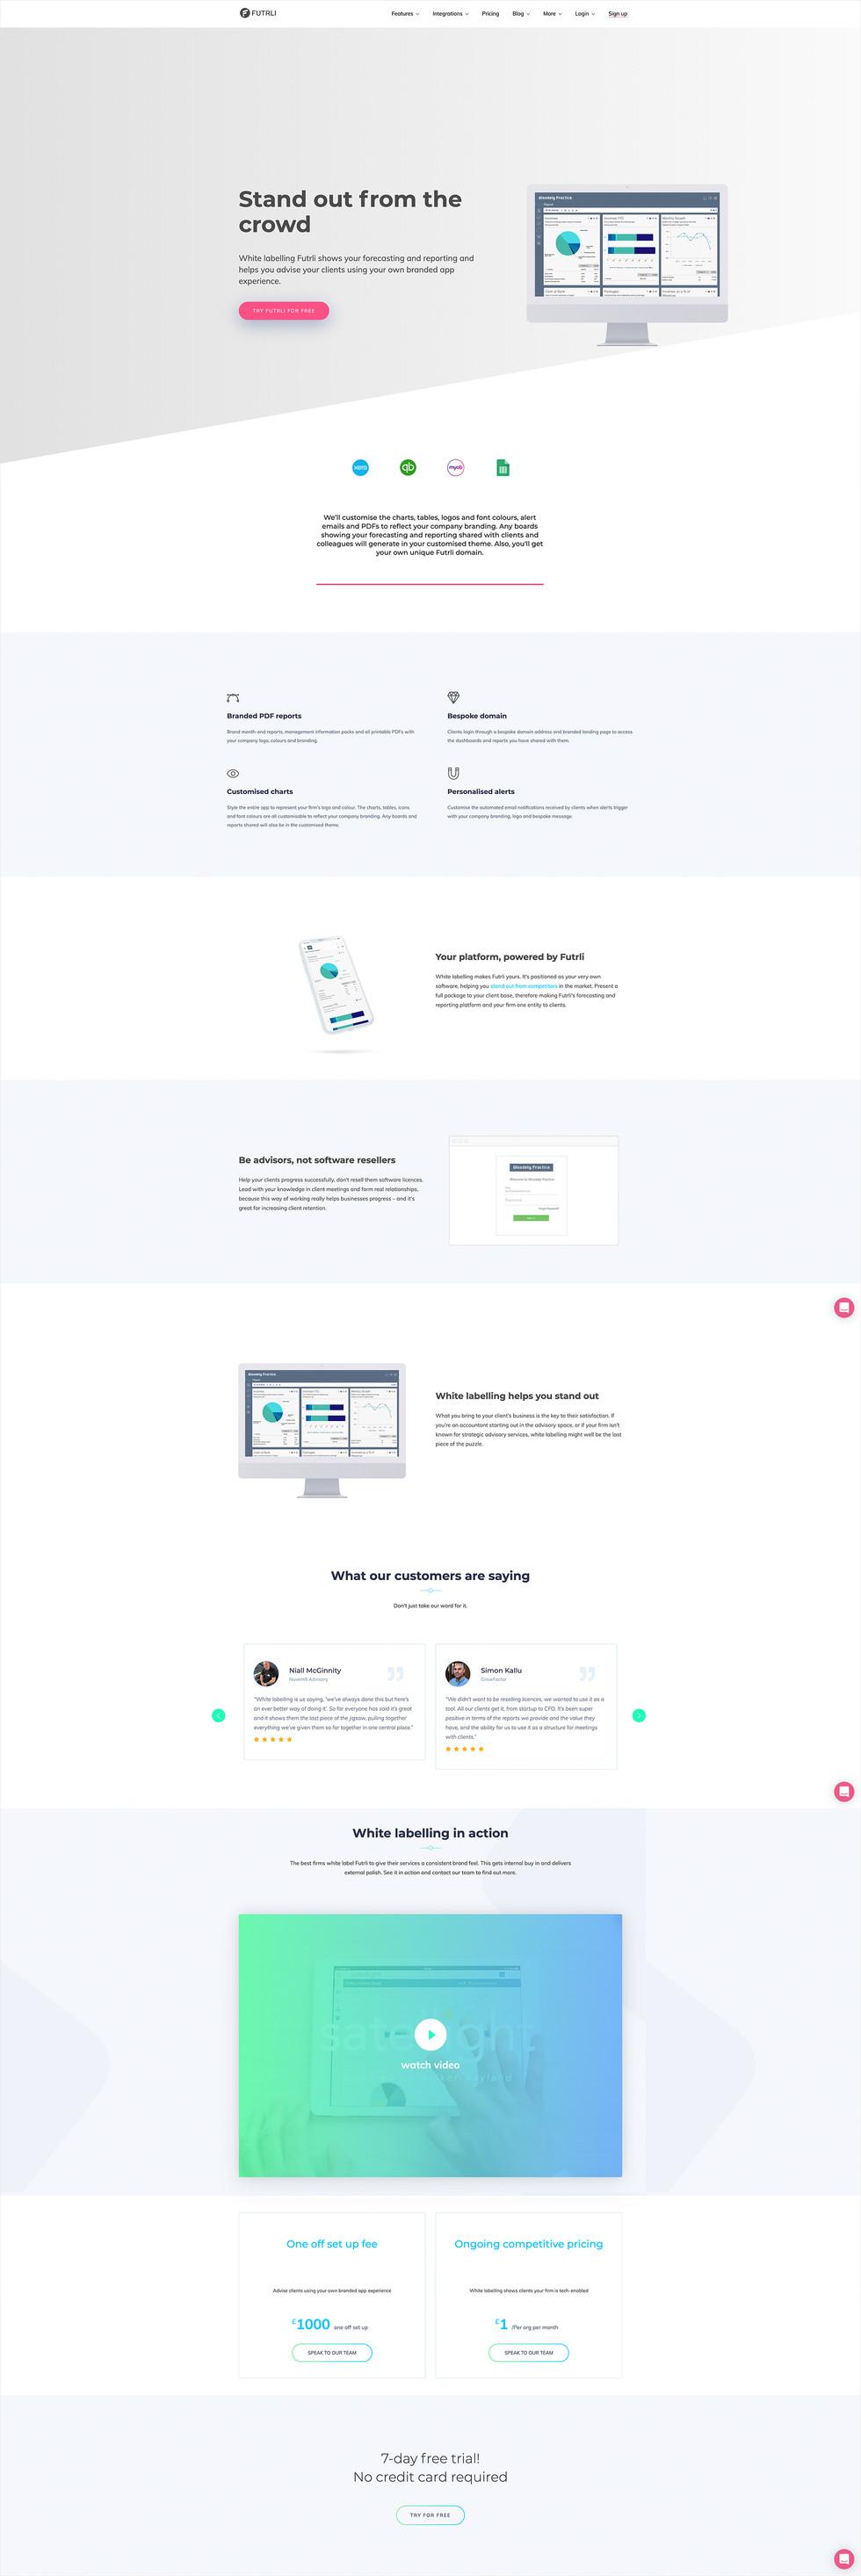 Whitelabel web page-2.jpg